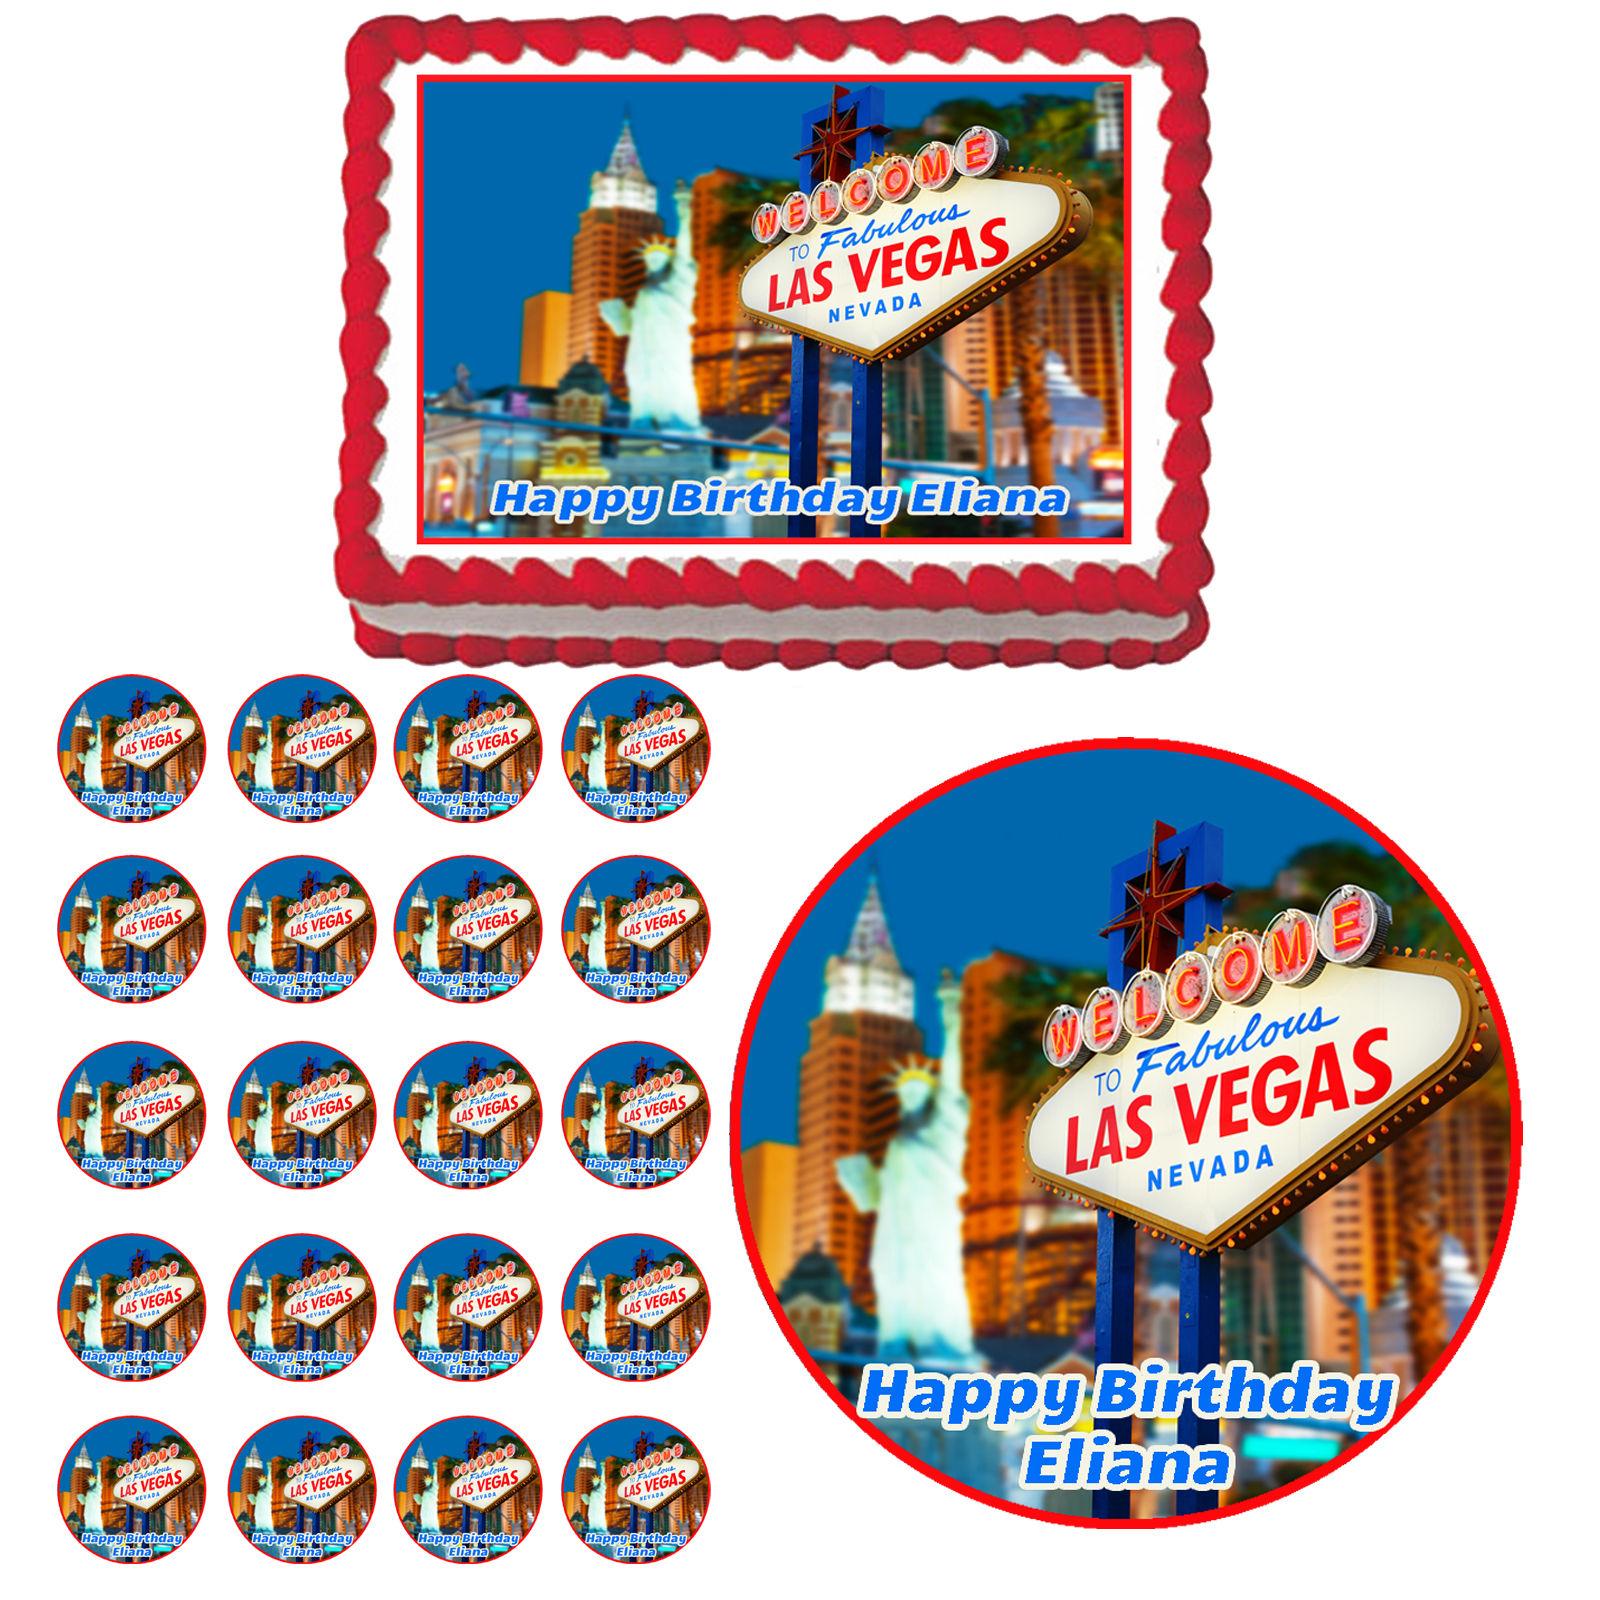 $8.75 - Las Vegas Sign Casino Edible Adult Birthday Party Cake ...